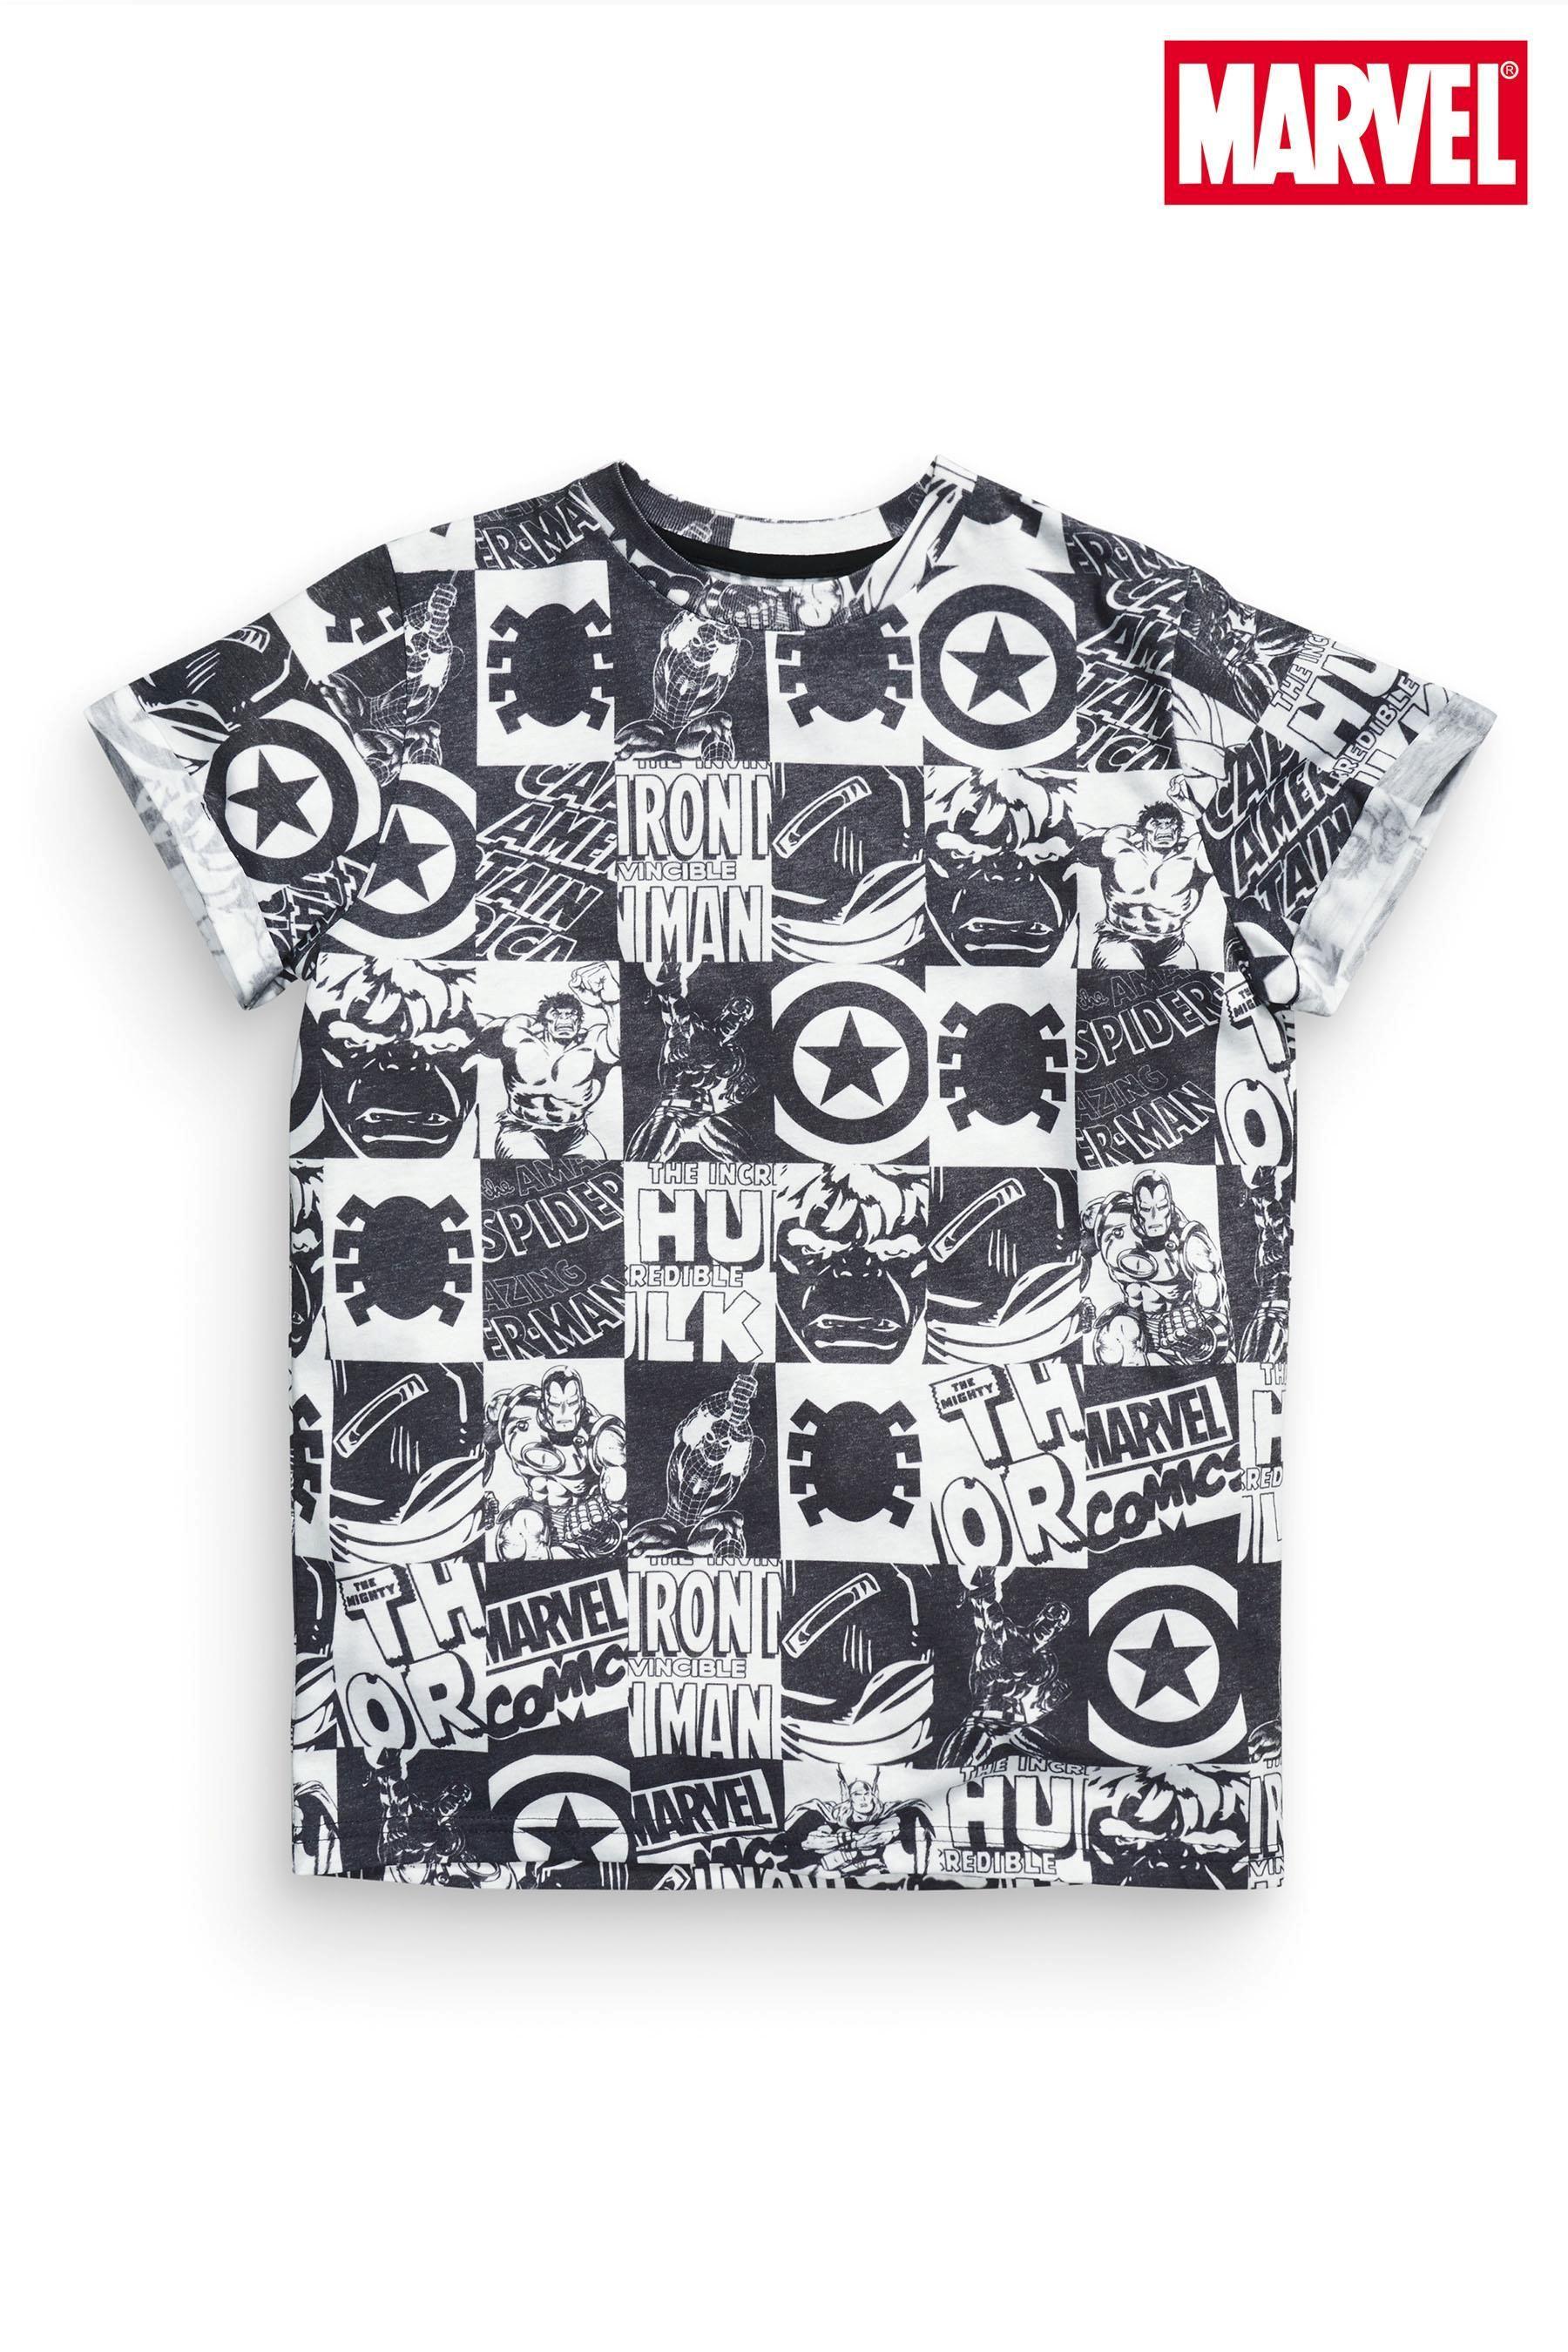 Shirt design online uk - Buy Mono All Over Print Avengers T Shirt From The Next Uk Online Shop